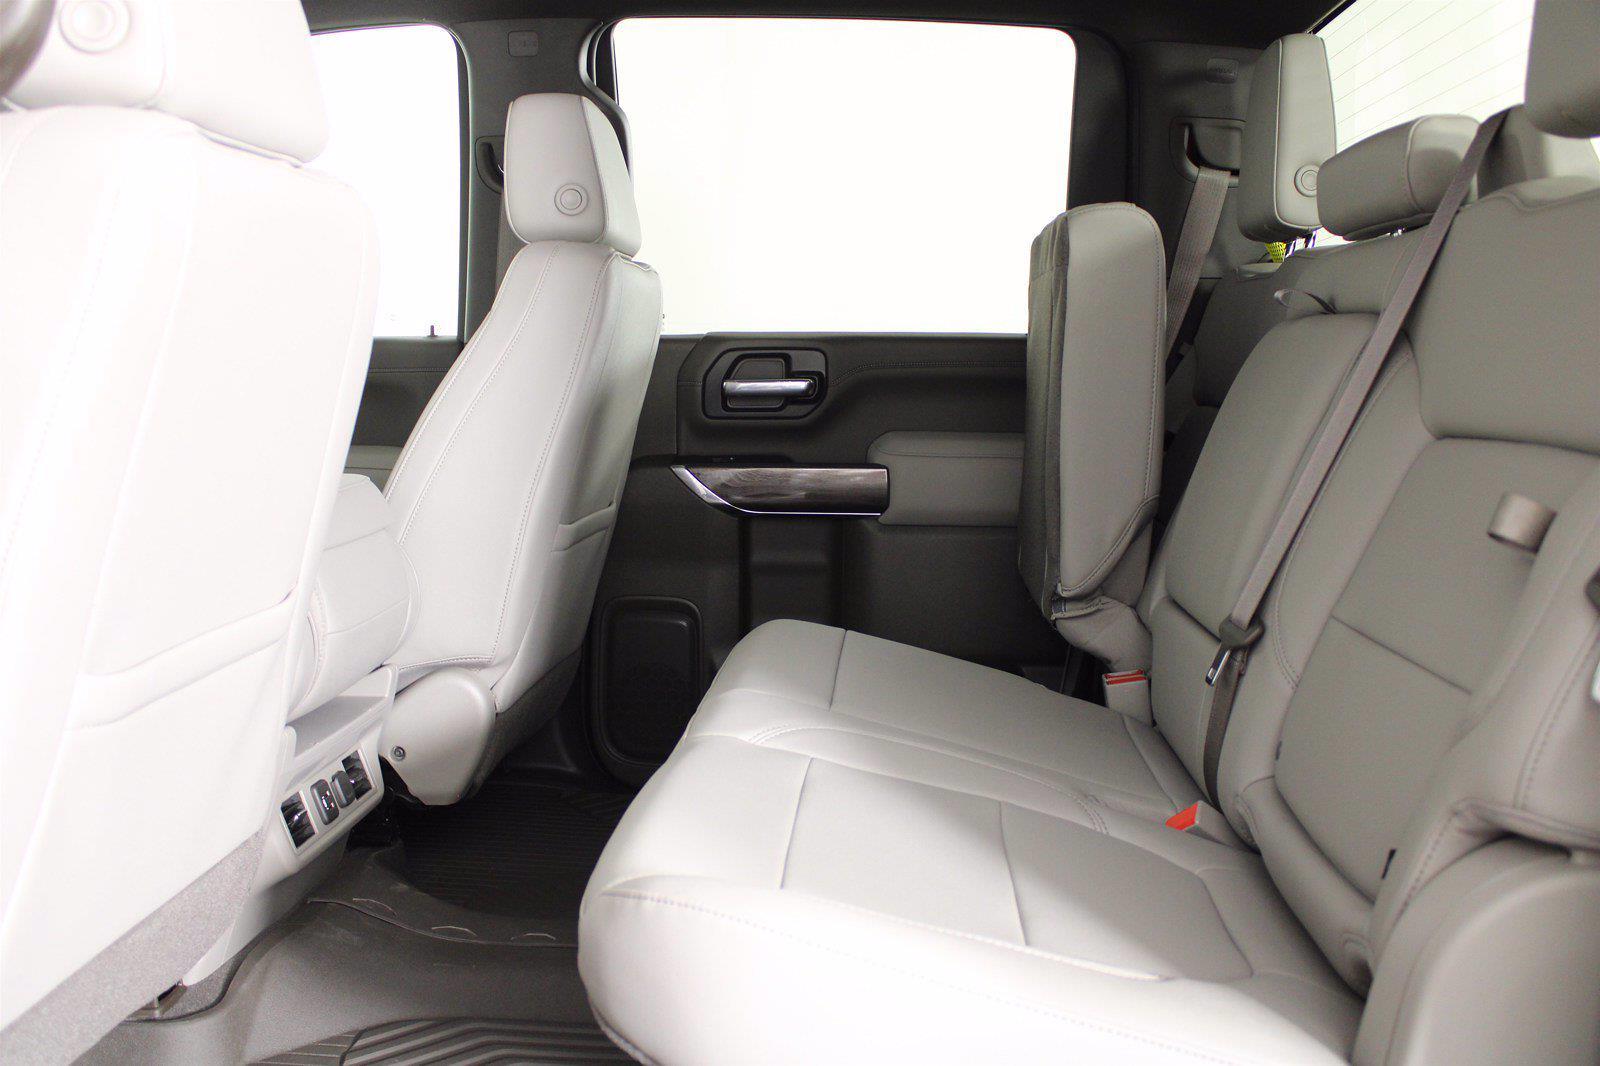 2021 Chevrolet Silverado 2500 Crew Cab 4x4, Pickup #D111097 - photo 15